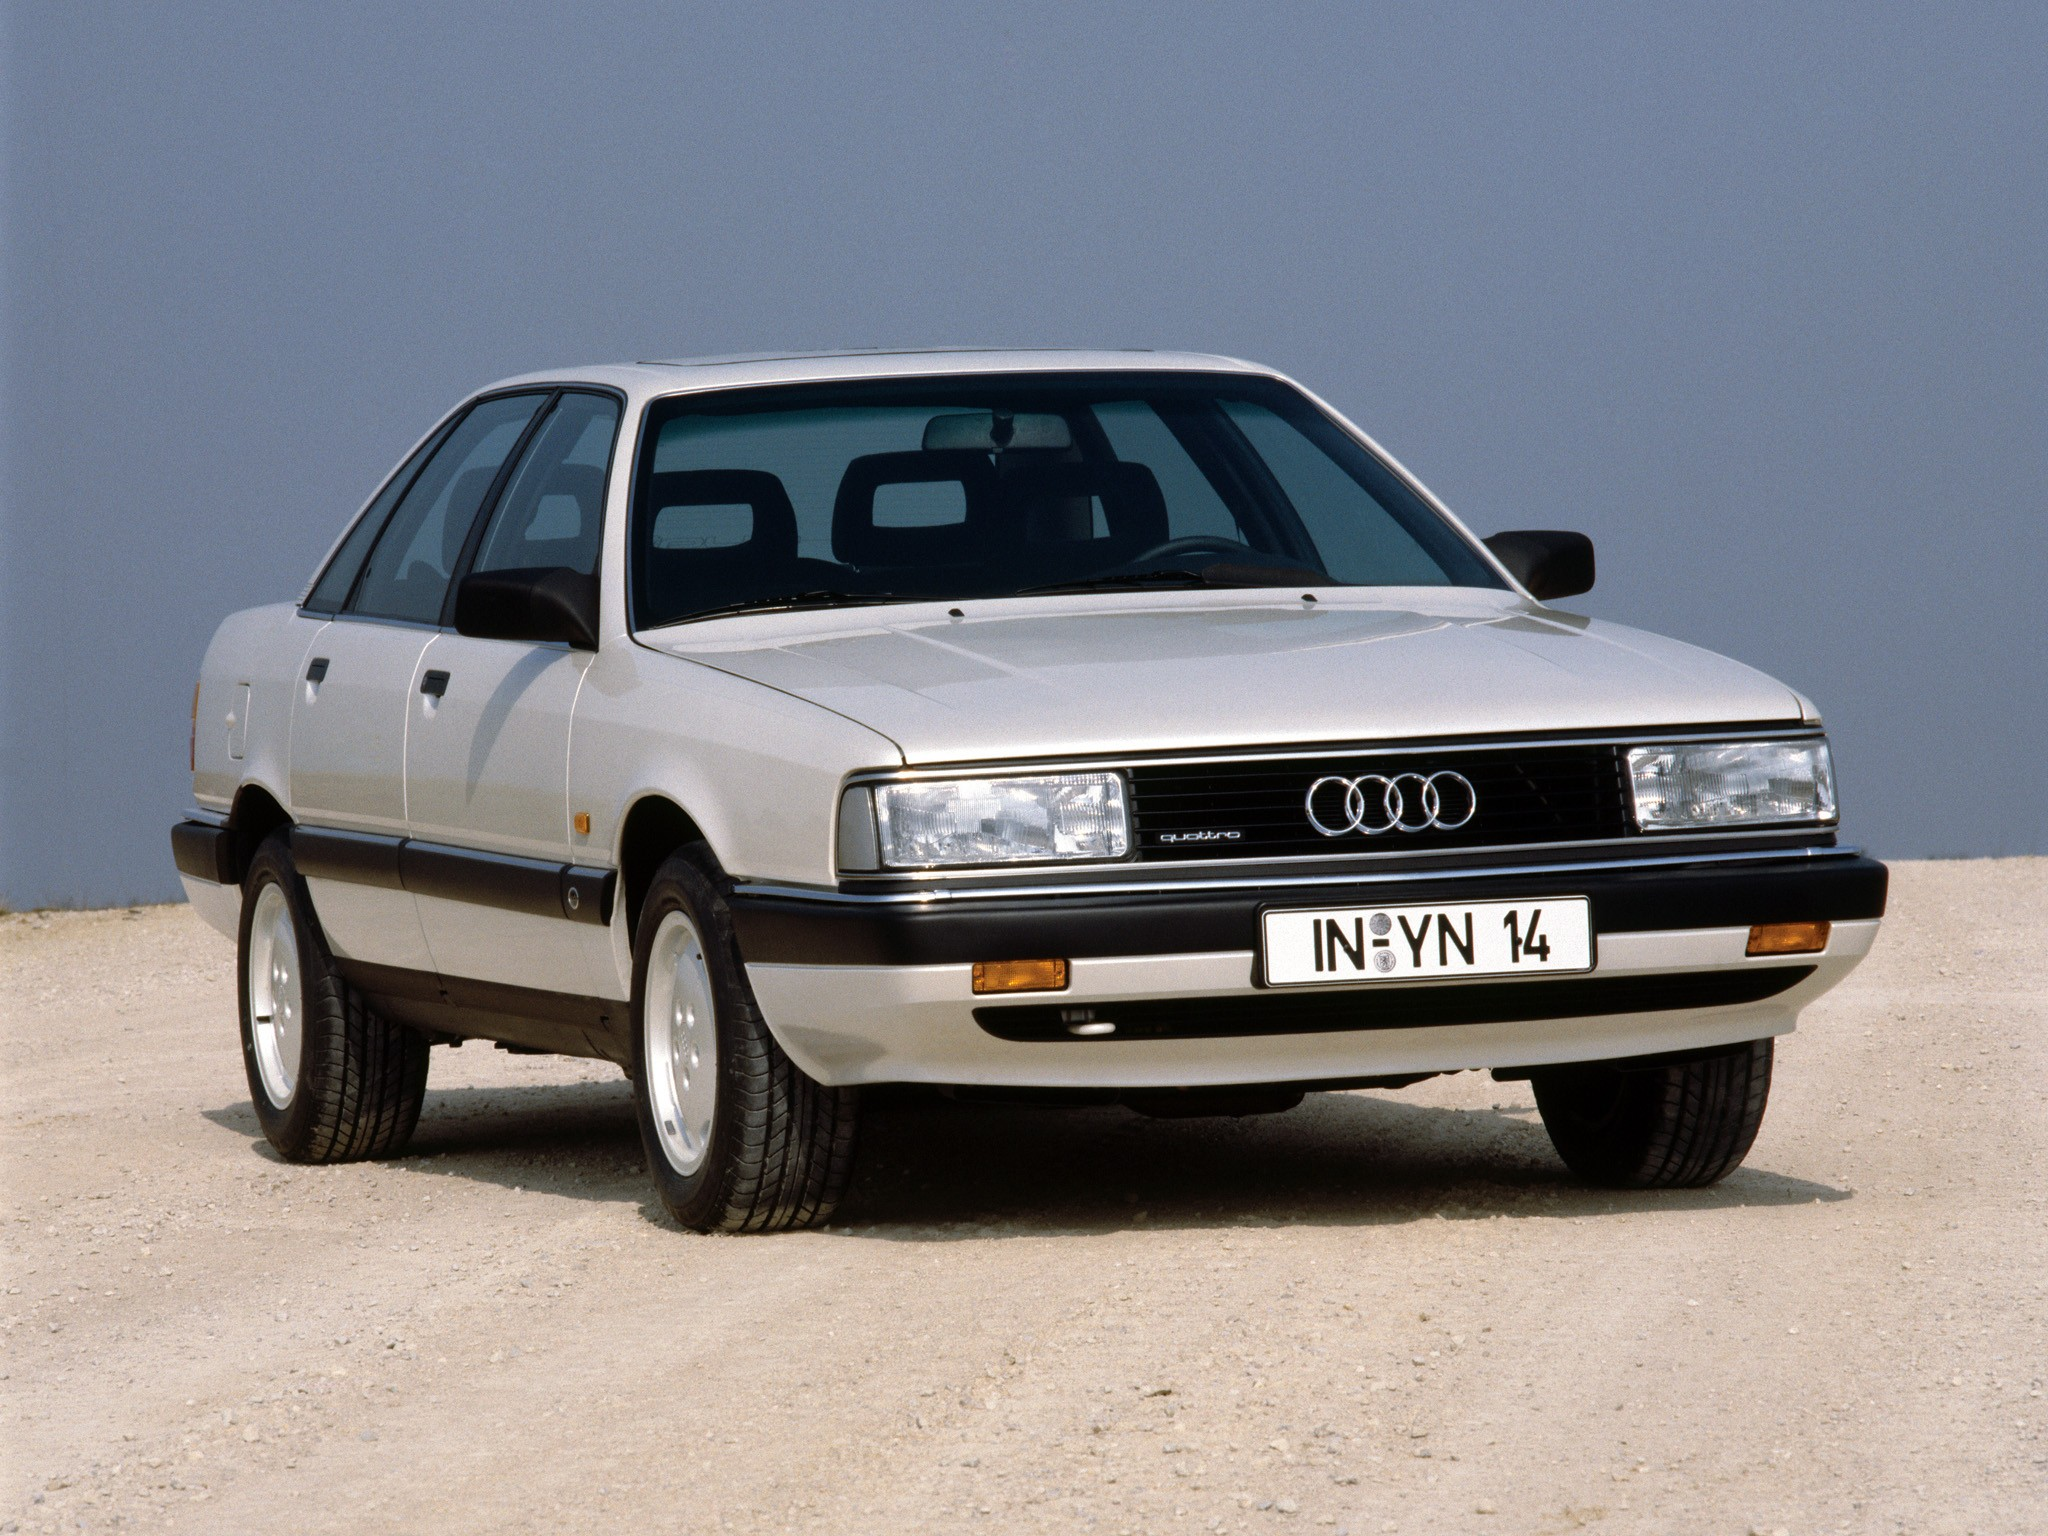 Audi 200 1984 1985 1986 1987 1988 1989 1990 1991